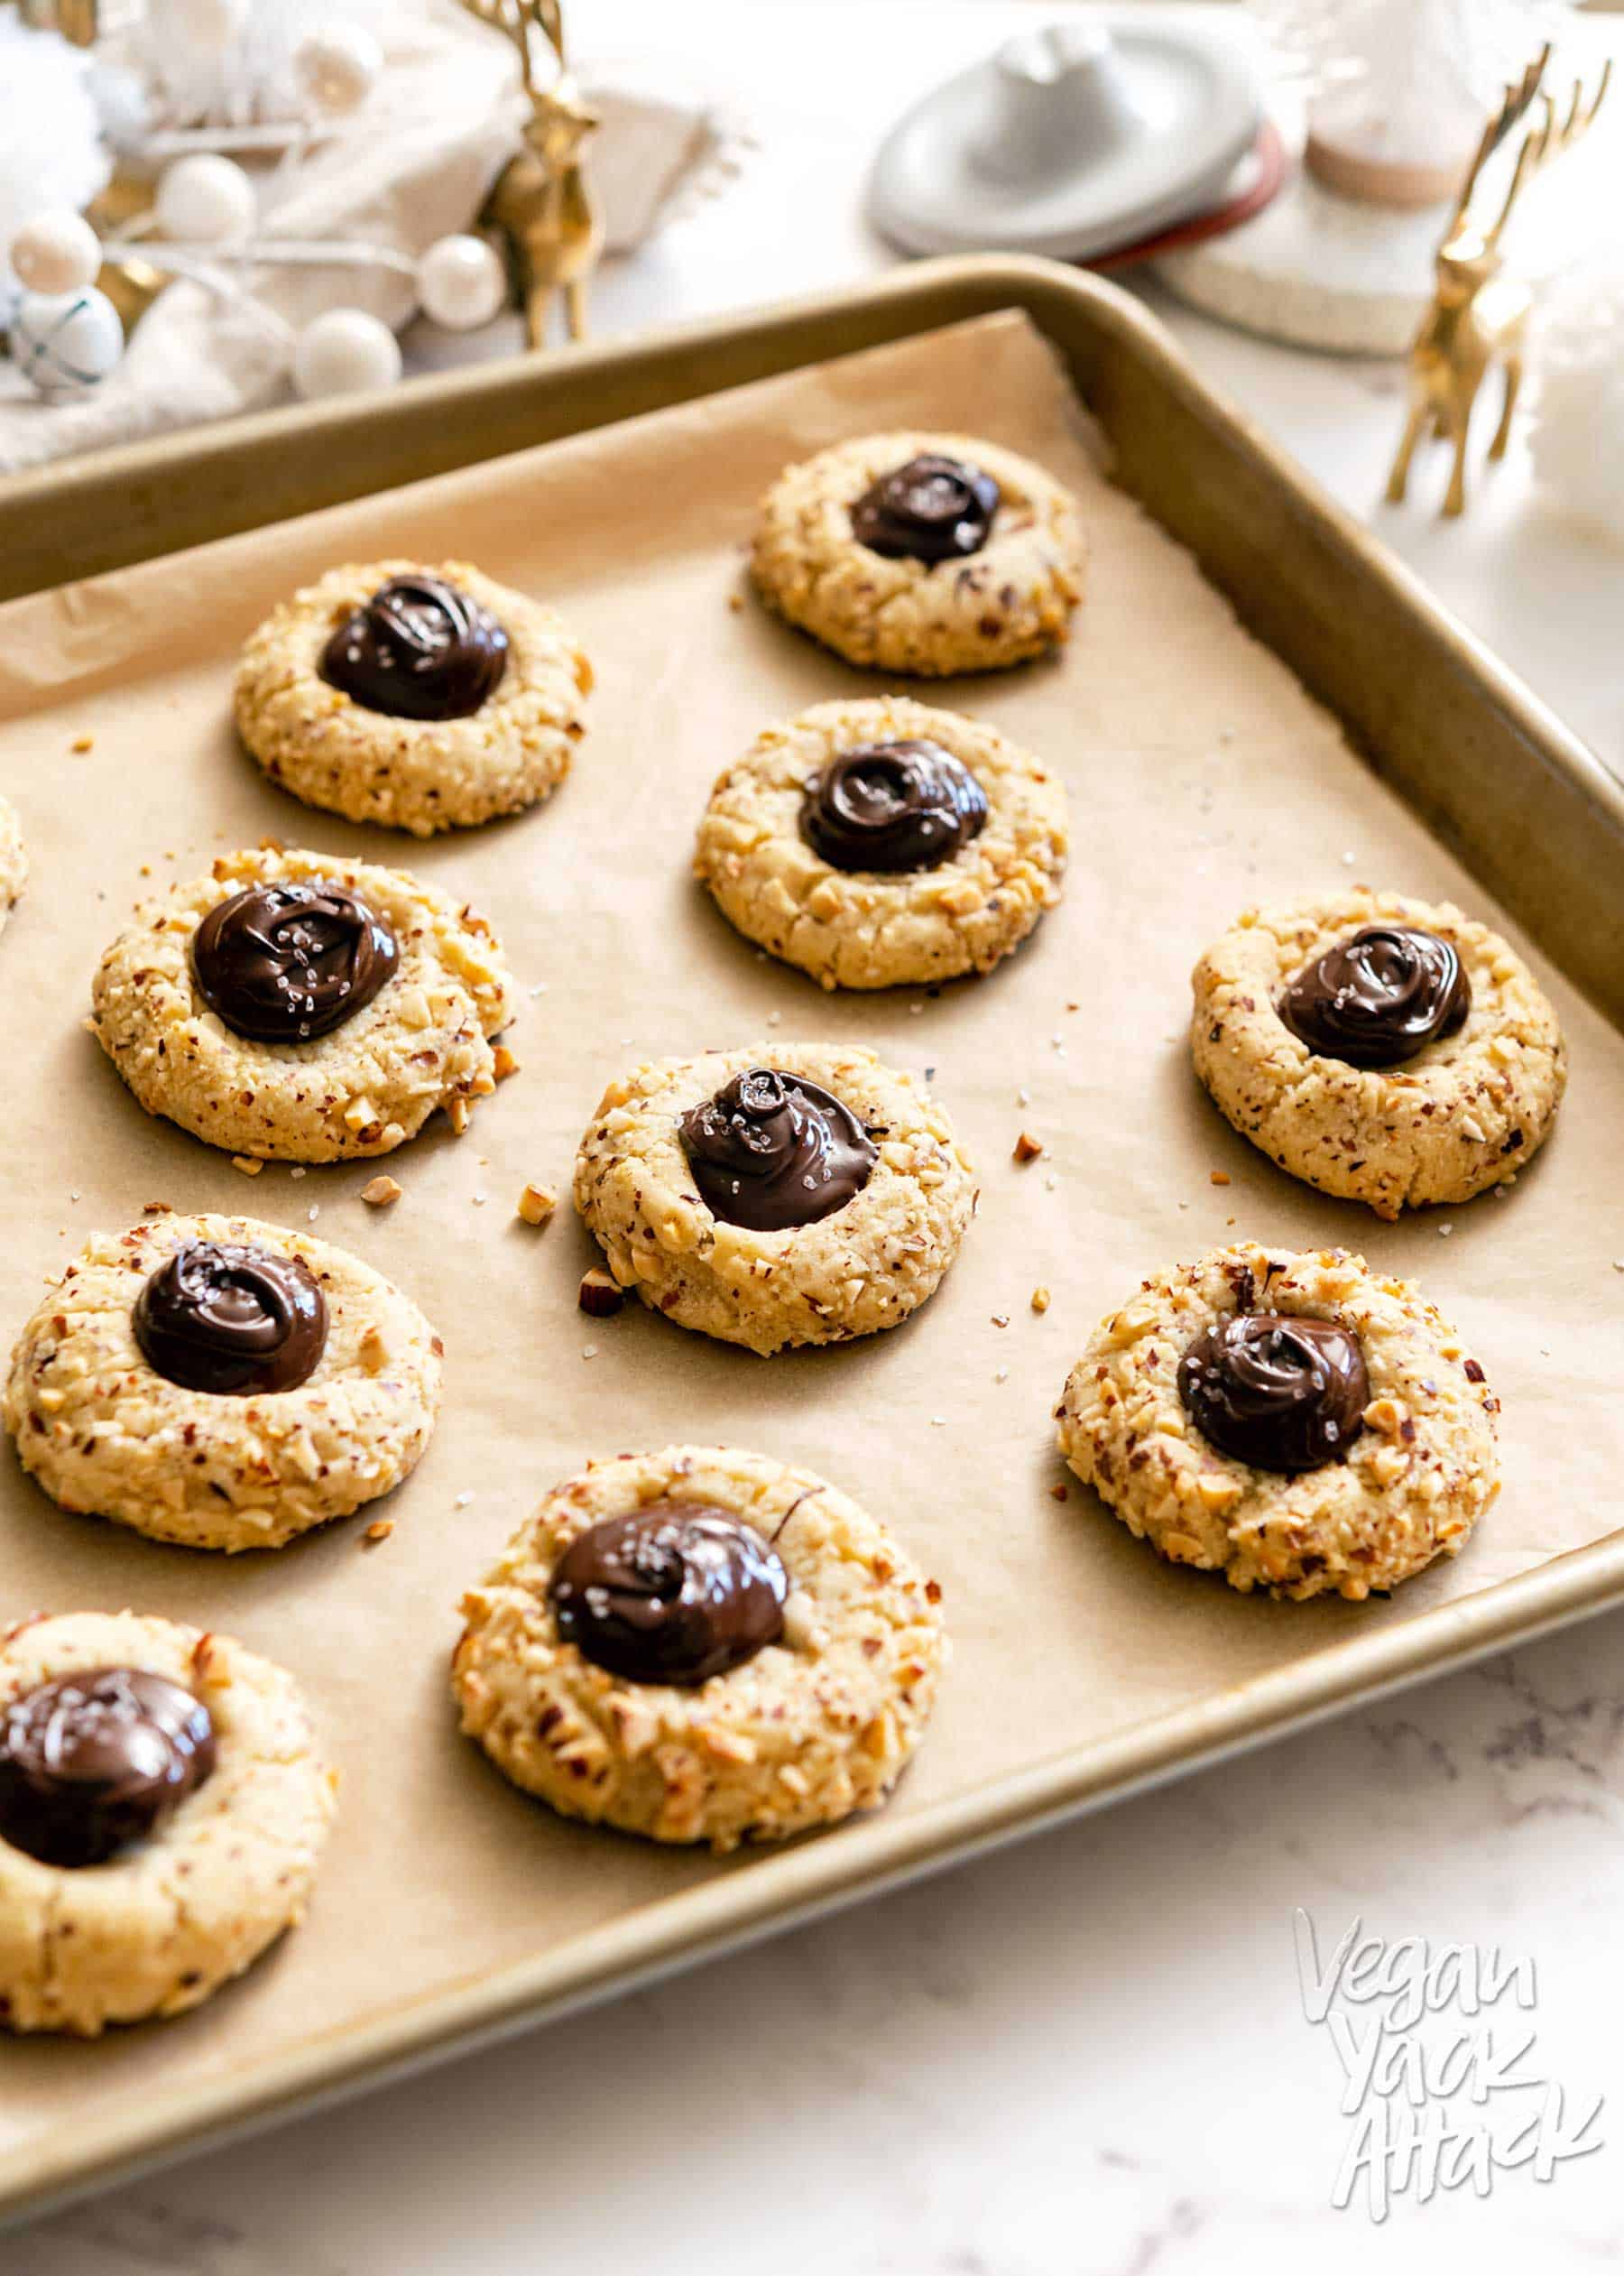 Sheet pan filled with chocolate hazelnut thumbprint cookies, and various Christmas decor